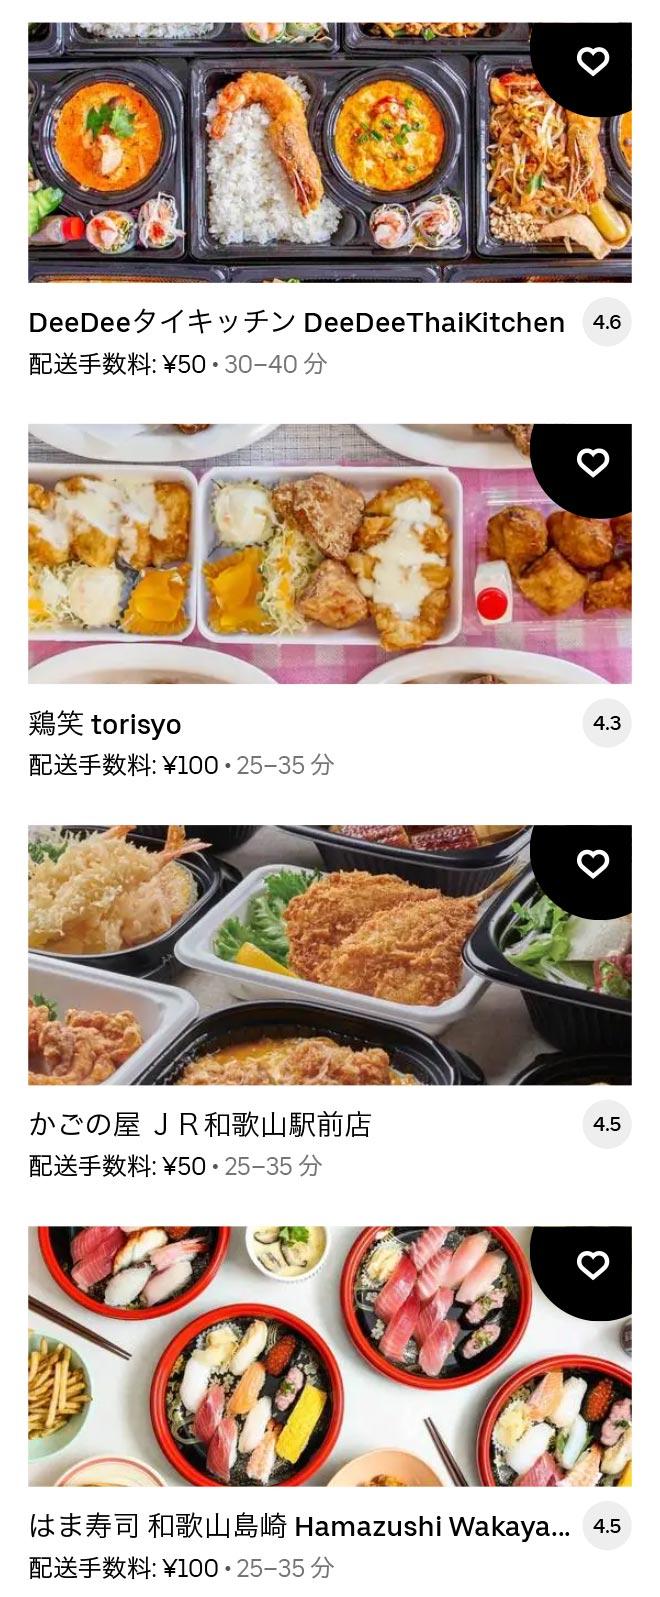 U wakayama menu 2104 10